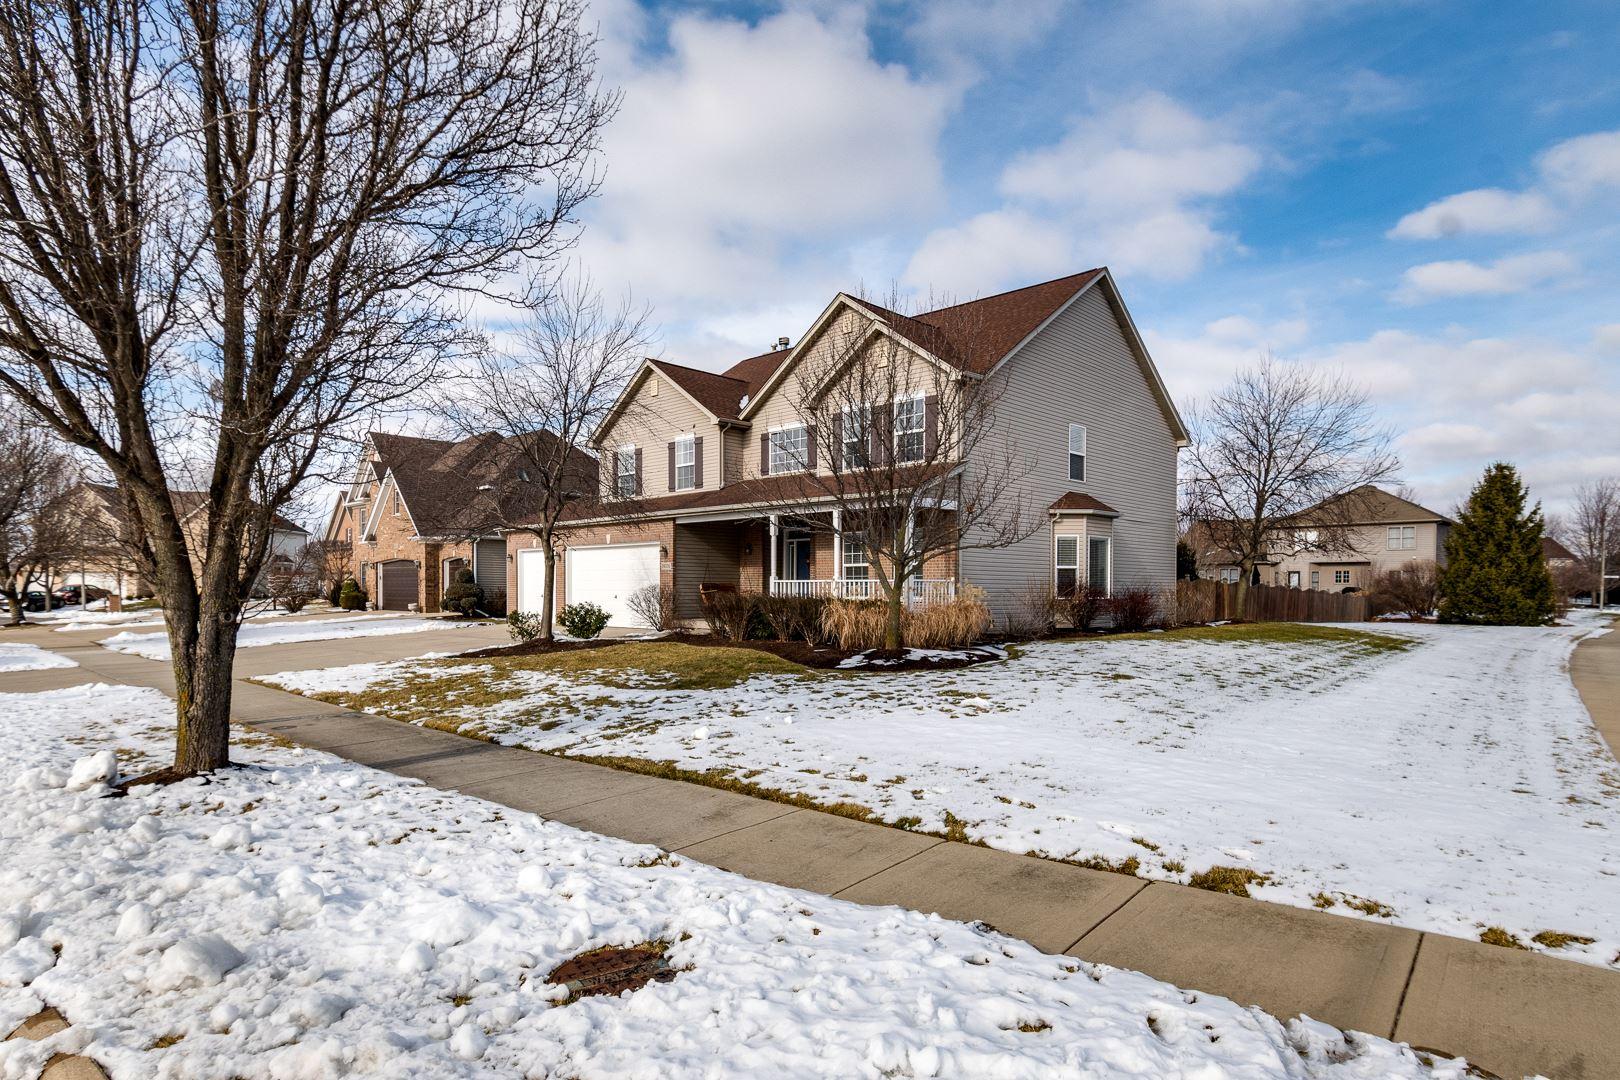 Photo of 24326 Crowfoot Court, Plainfield, IL 60585 (MLS # 10953781)